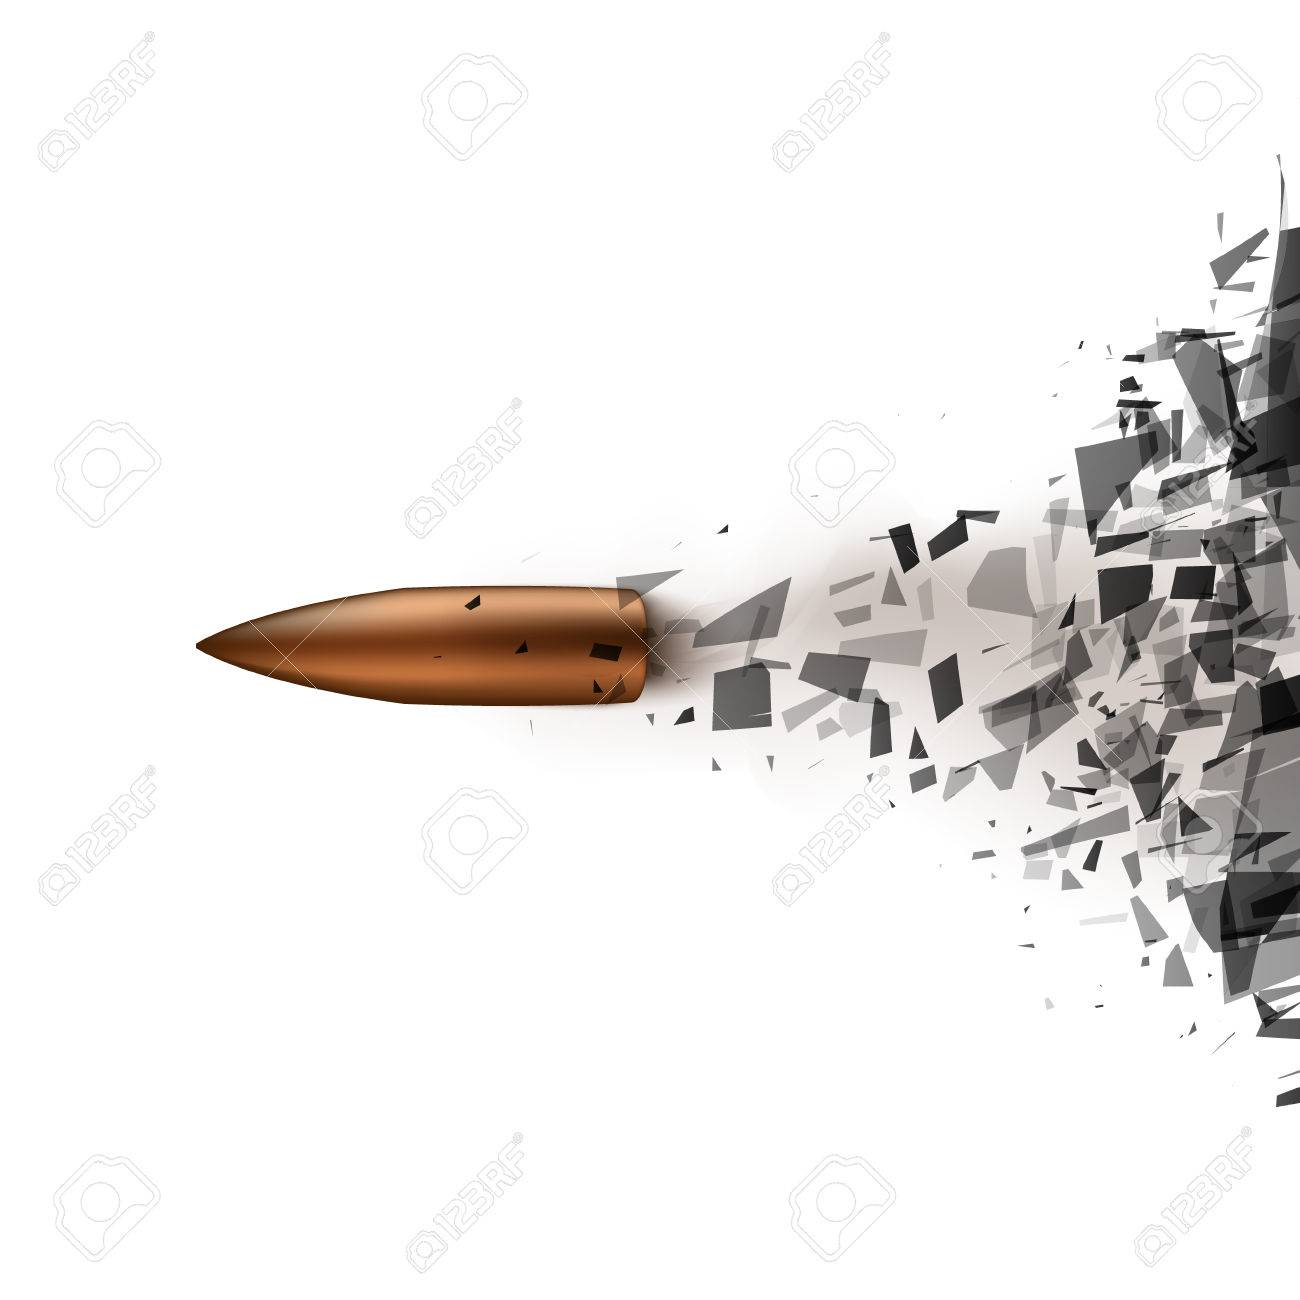 Bullet shot smashed the glass in the splinters illustration - 49020824